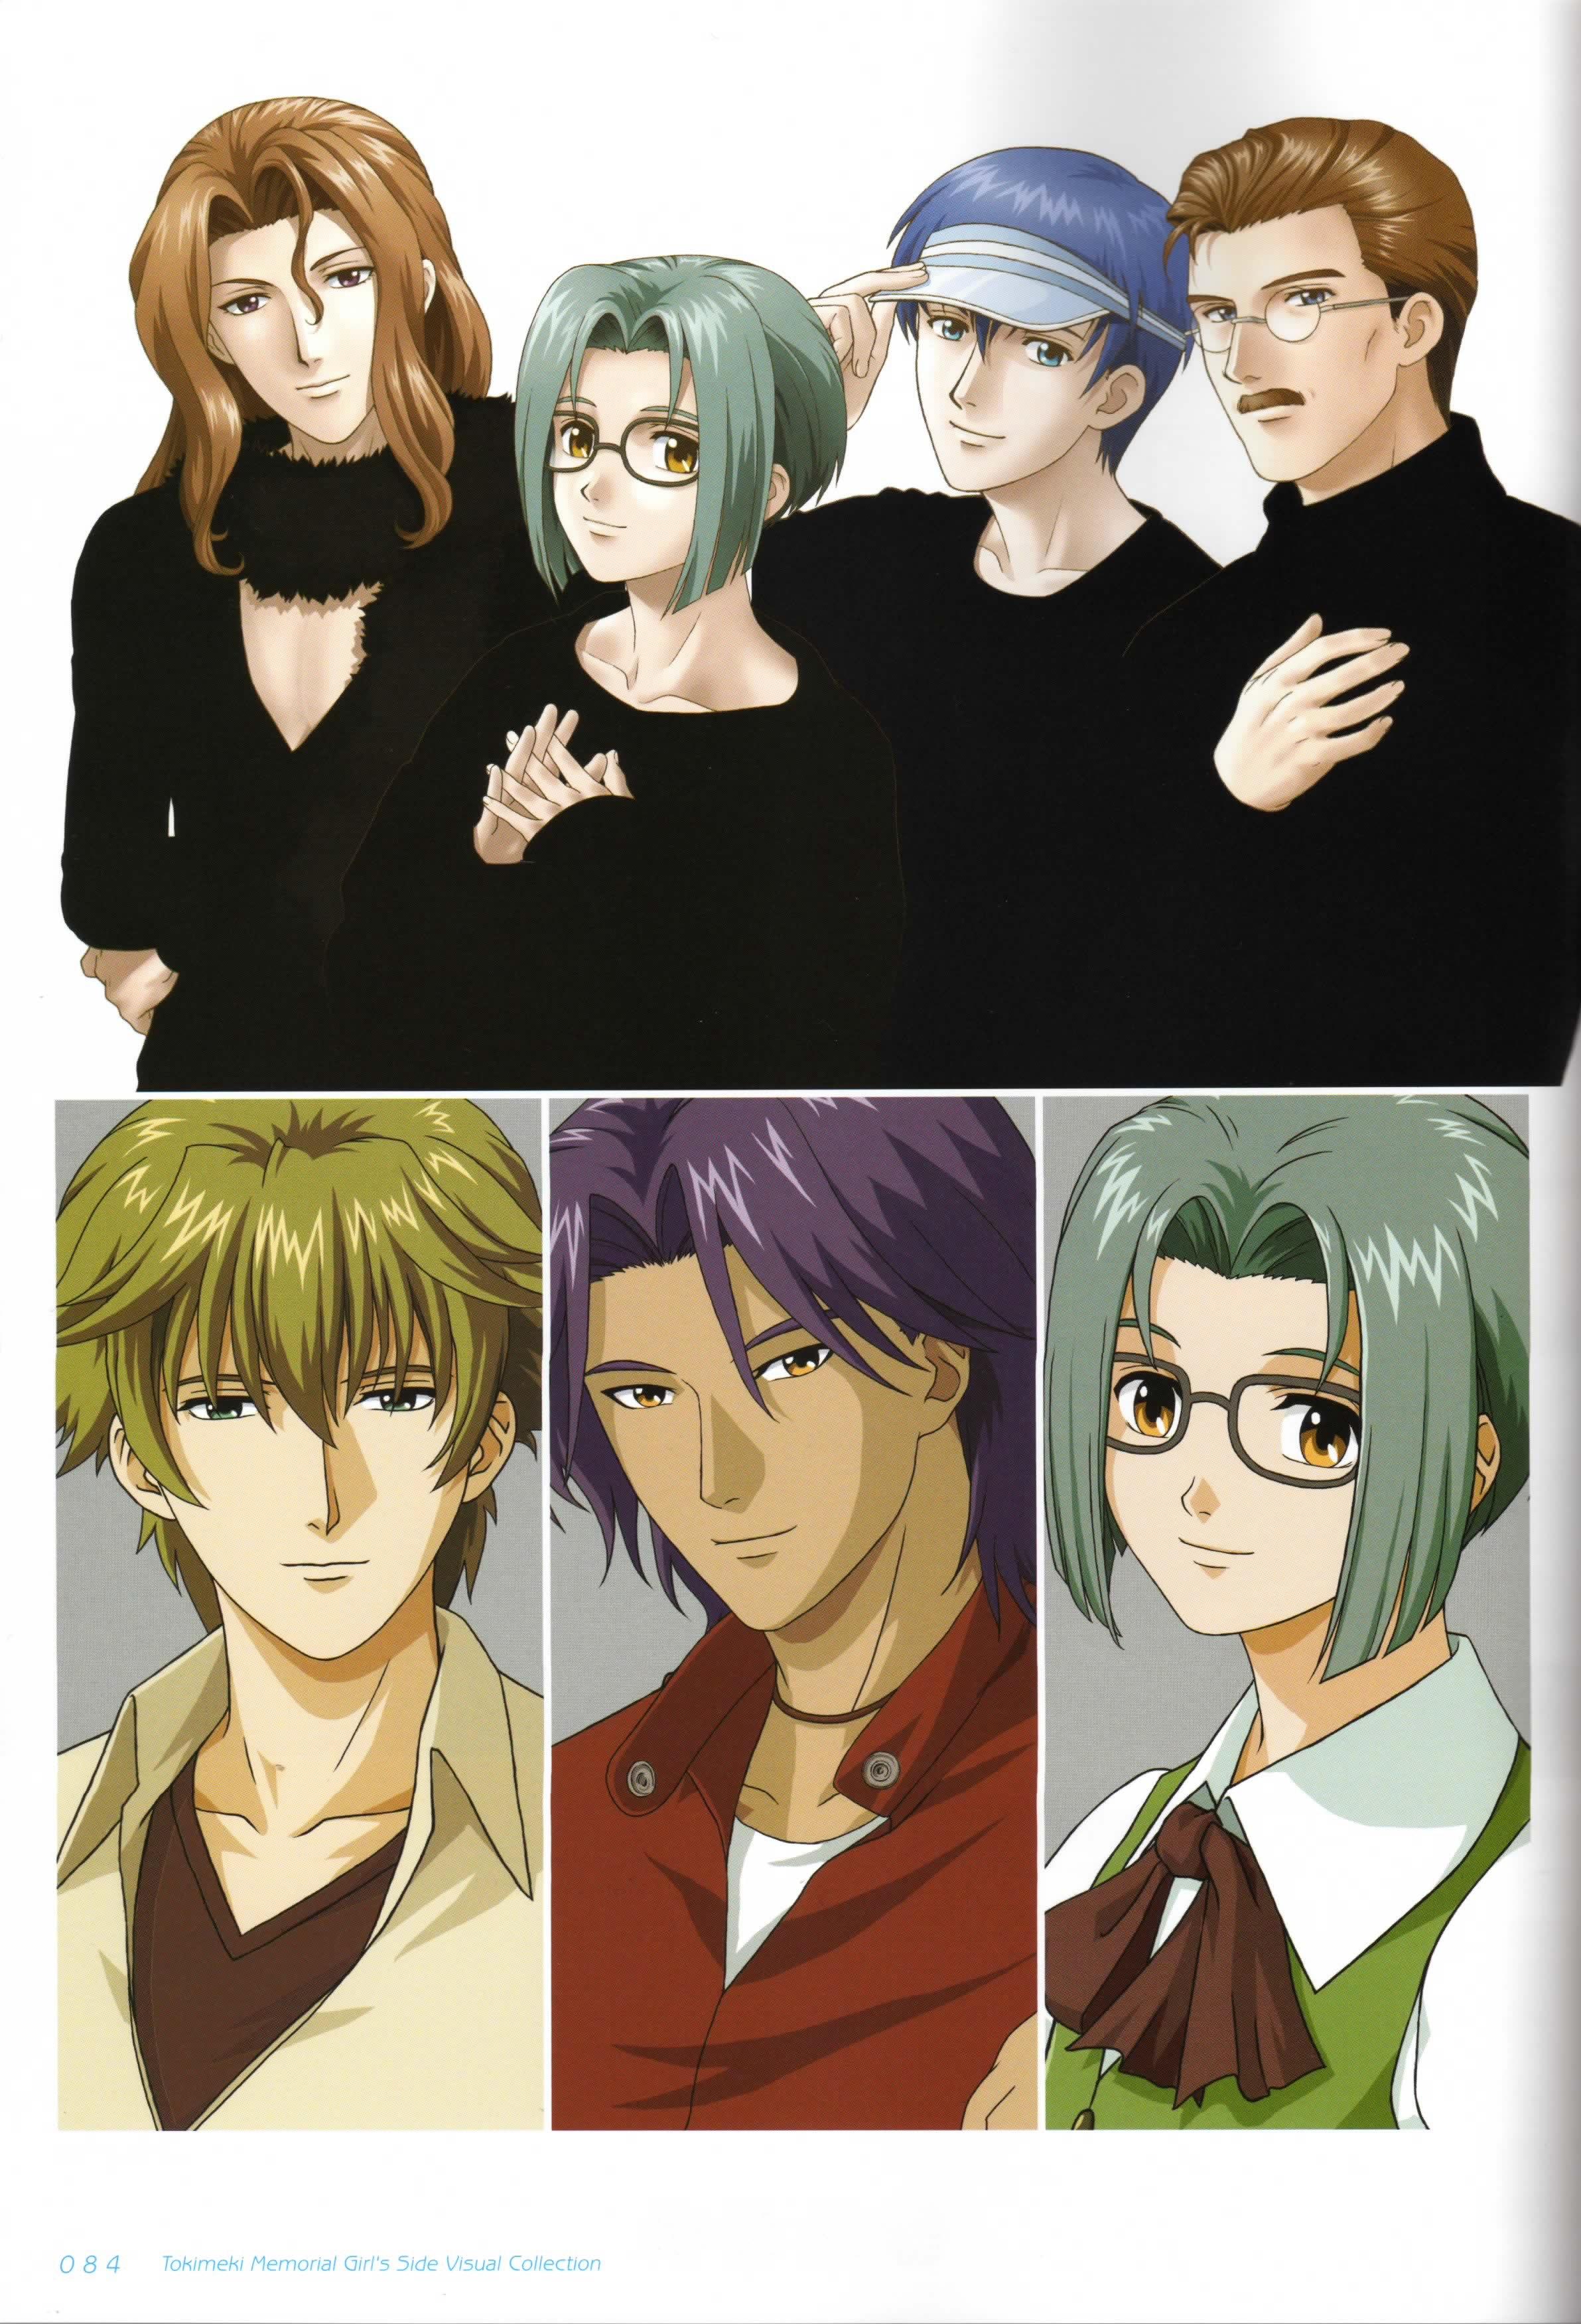 Tokimeki Memorial Girl S Side 1st Love Image 477146 Zerochan Anime Image Board